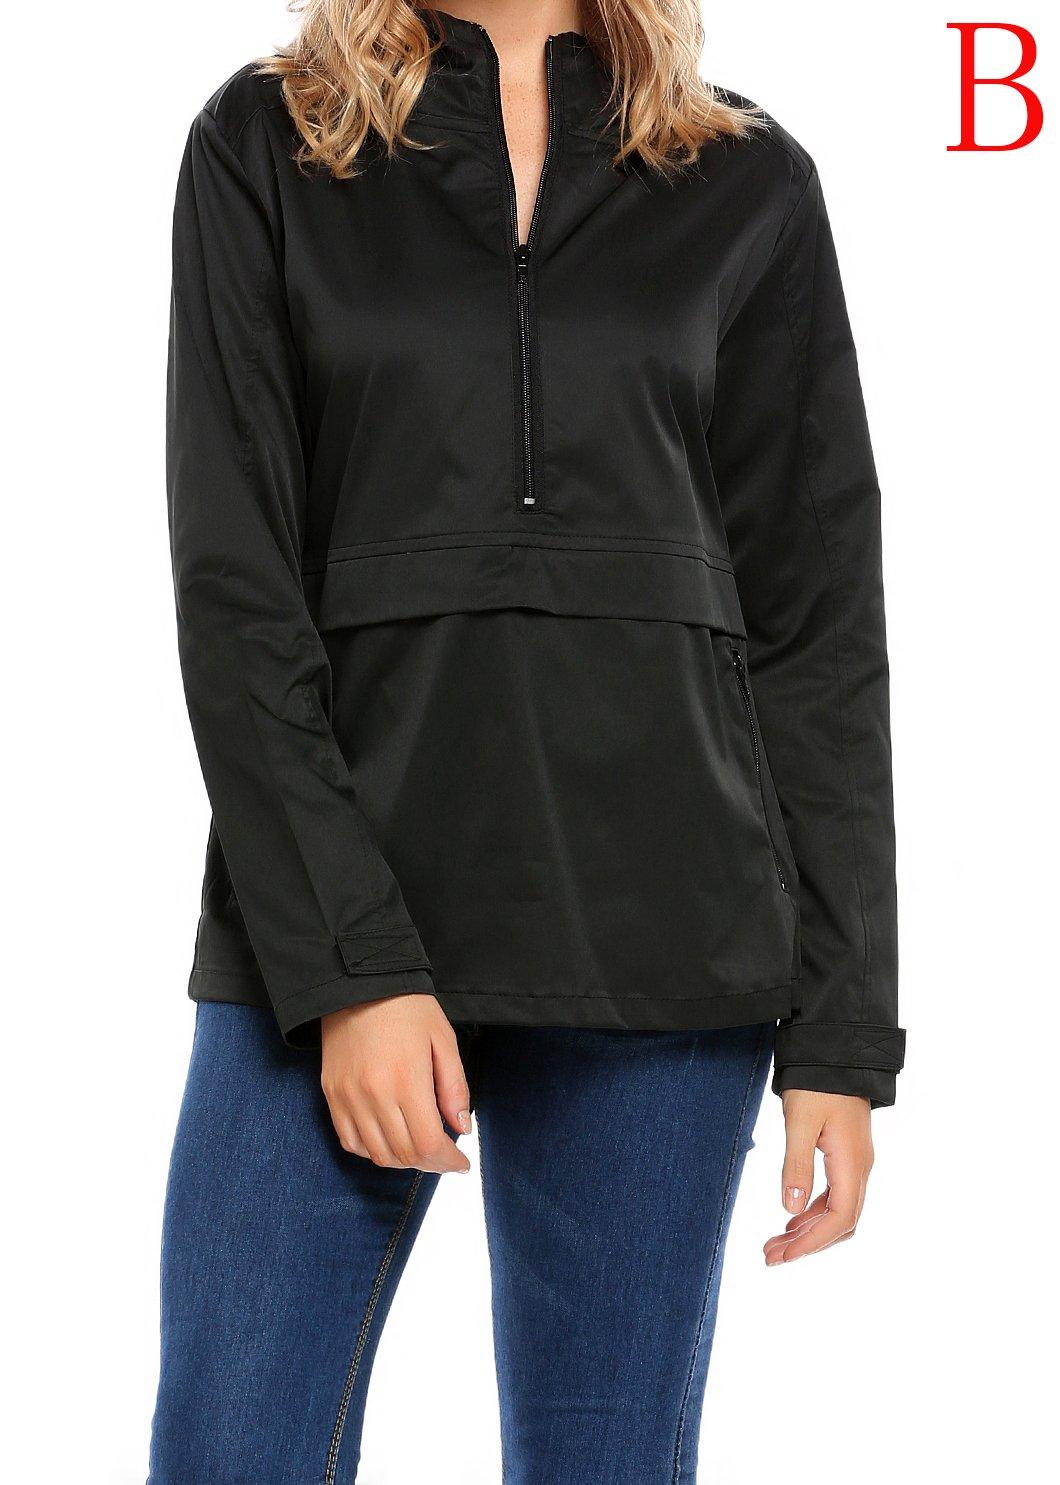 SummerRio Women's Waterproof Venture Resolve Softshell Rainwear Jacket (Black,Medium) by SummerRio (Image #2)